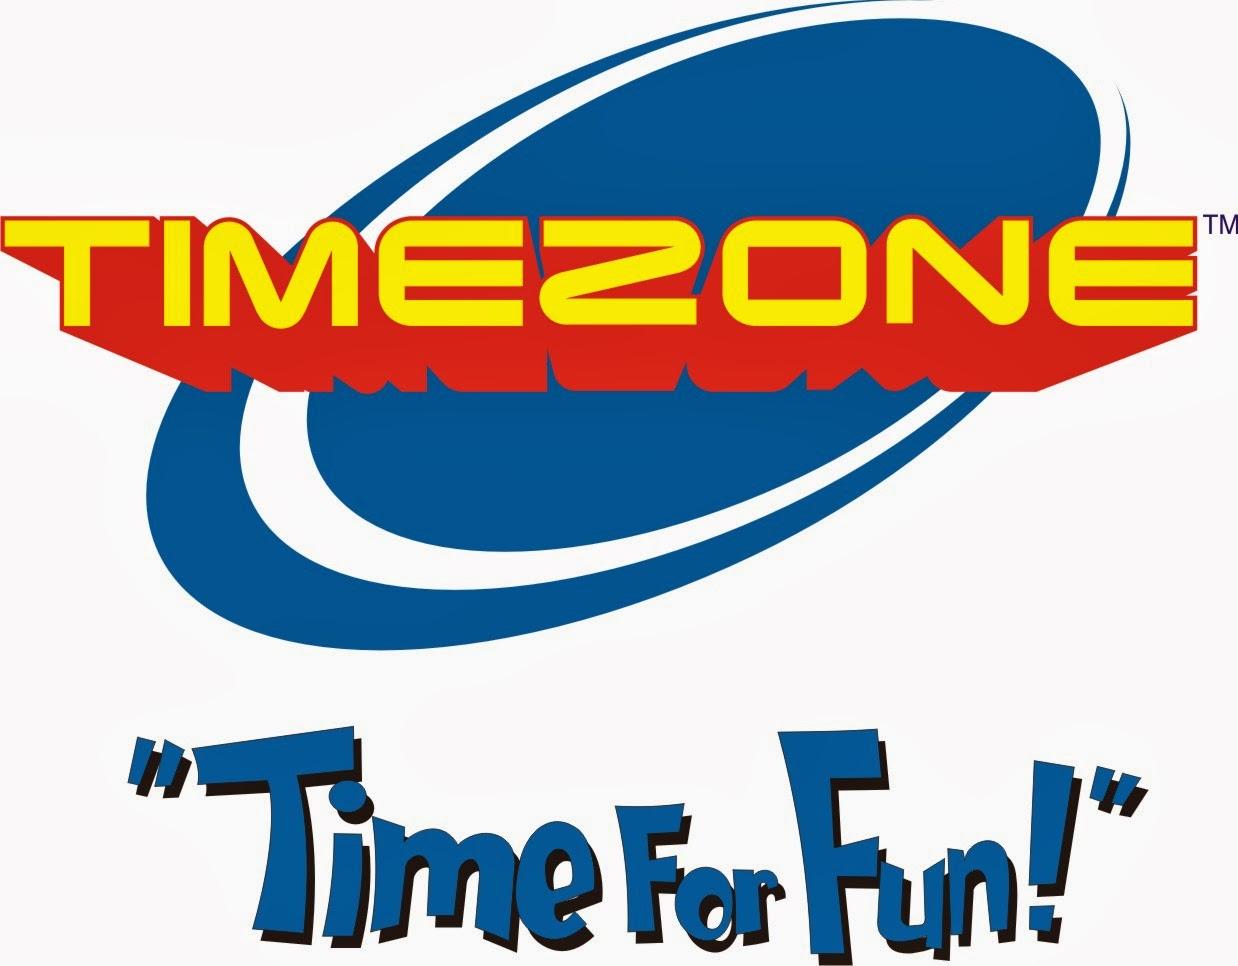 Lowongan Kerja Customer Service Attendant dan Teknisi di PT. Matahari Graha Fantasi (TimeZone) – Semarang